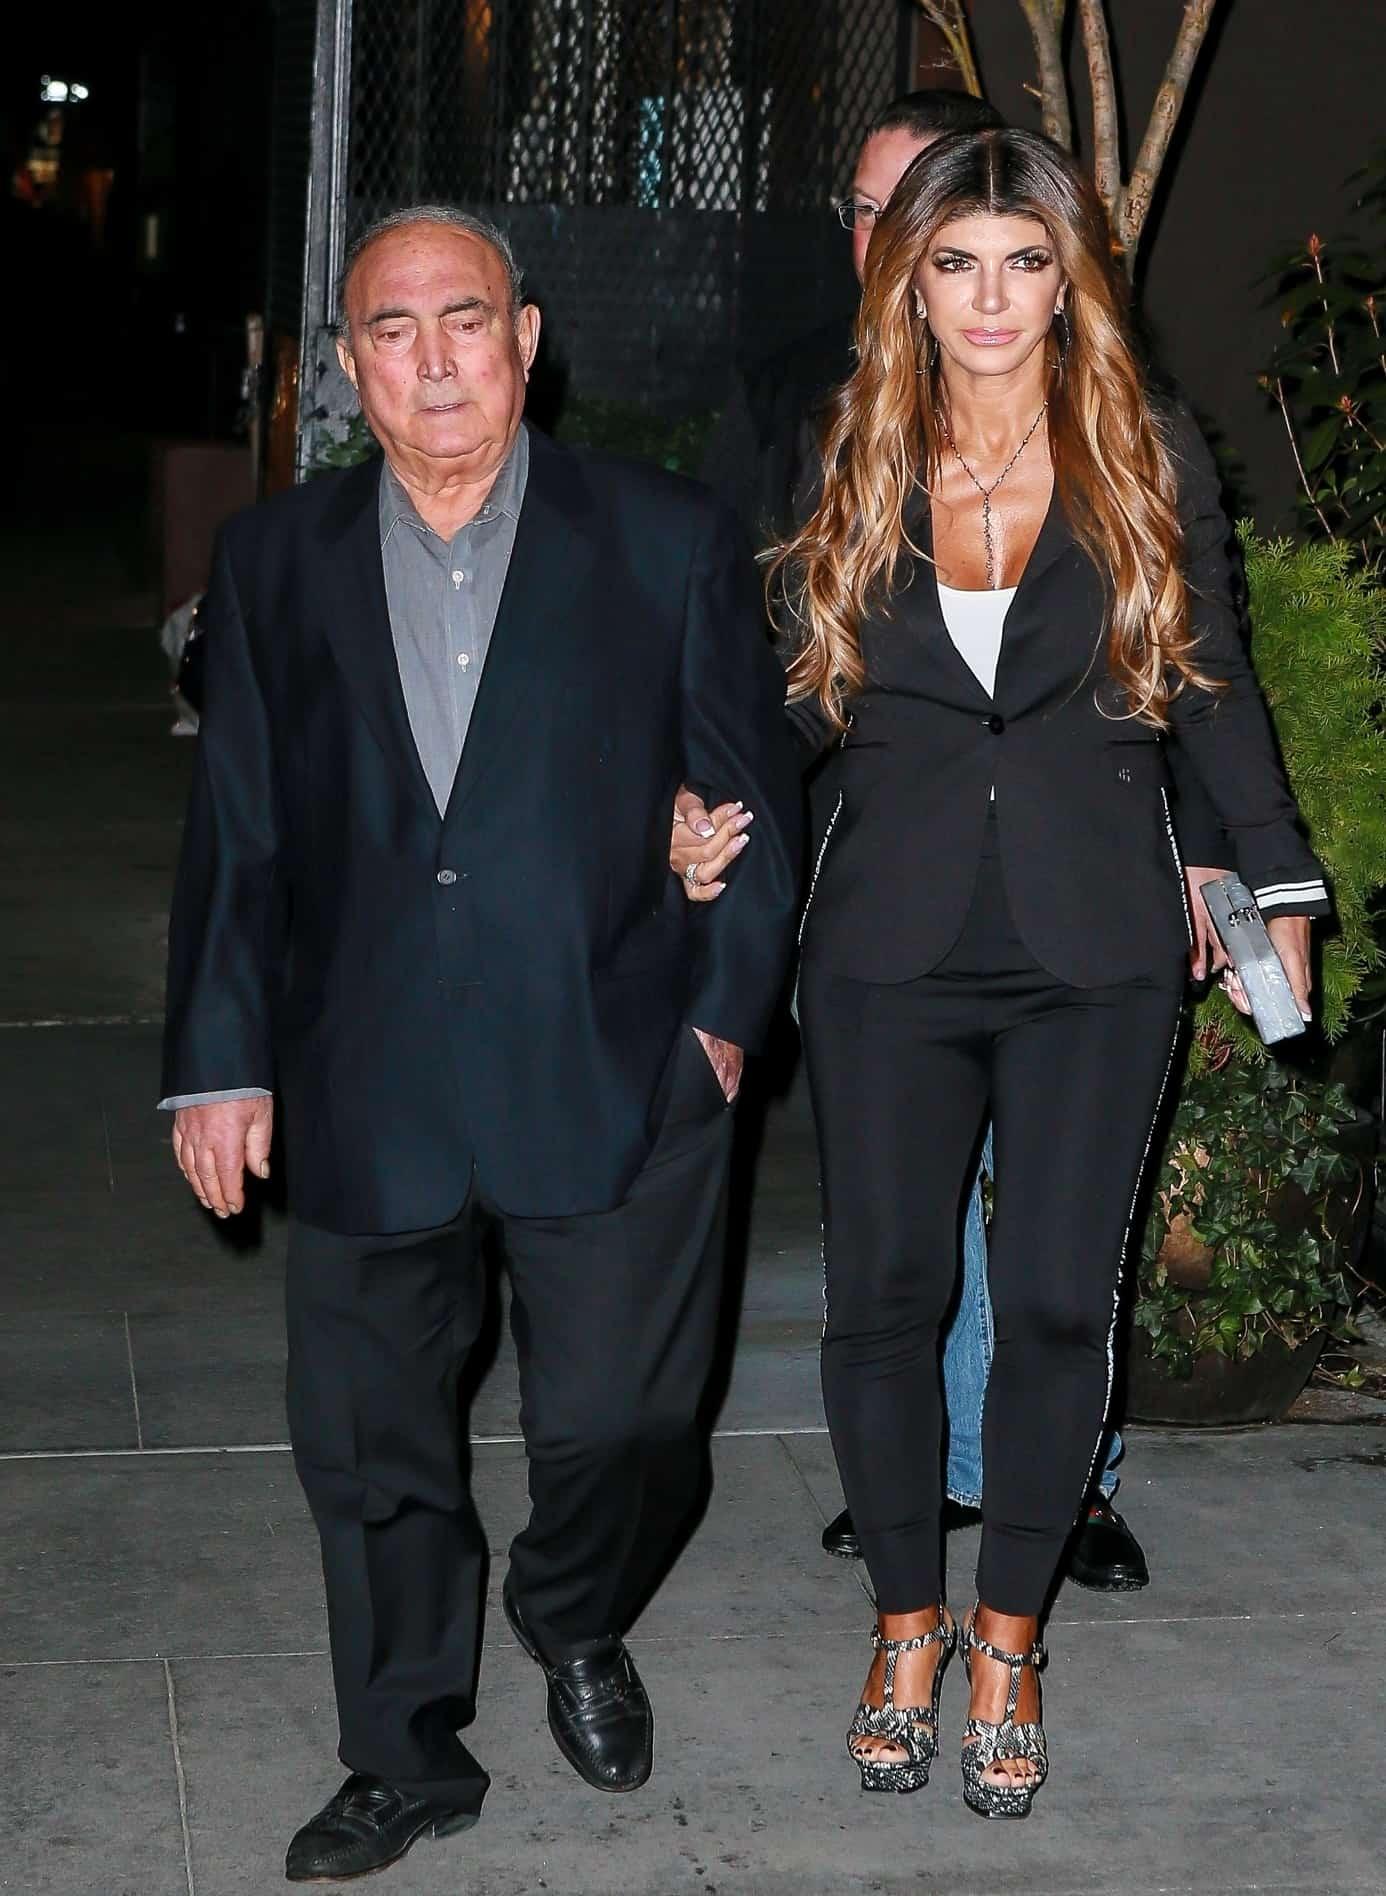 Teresa Giudice and dad Giacinto Gorga